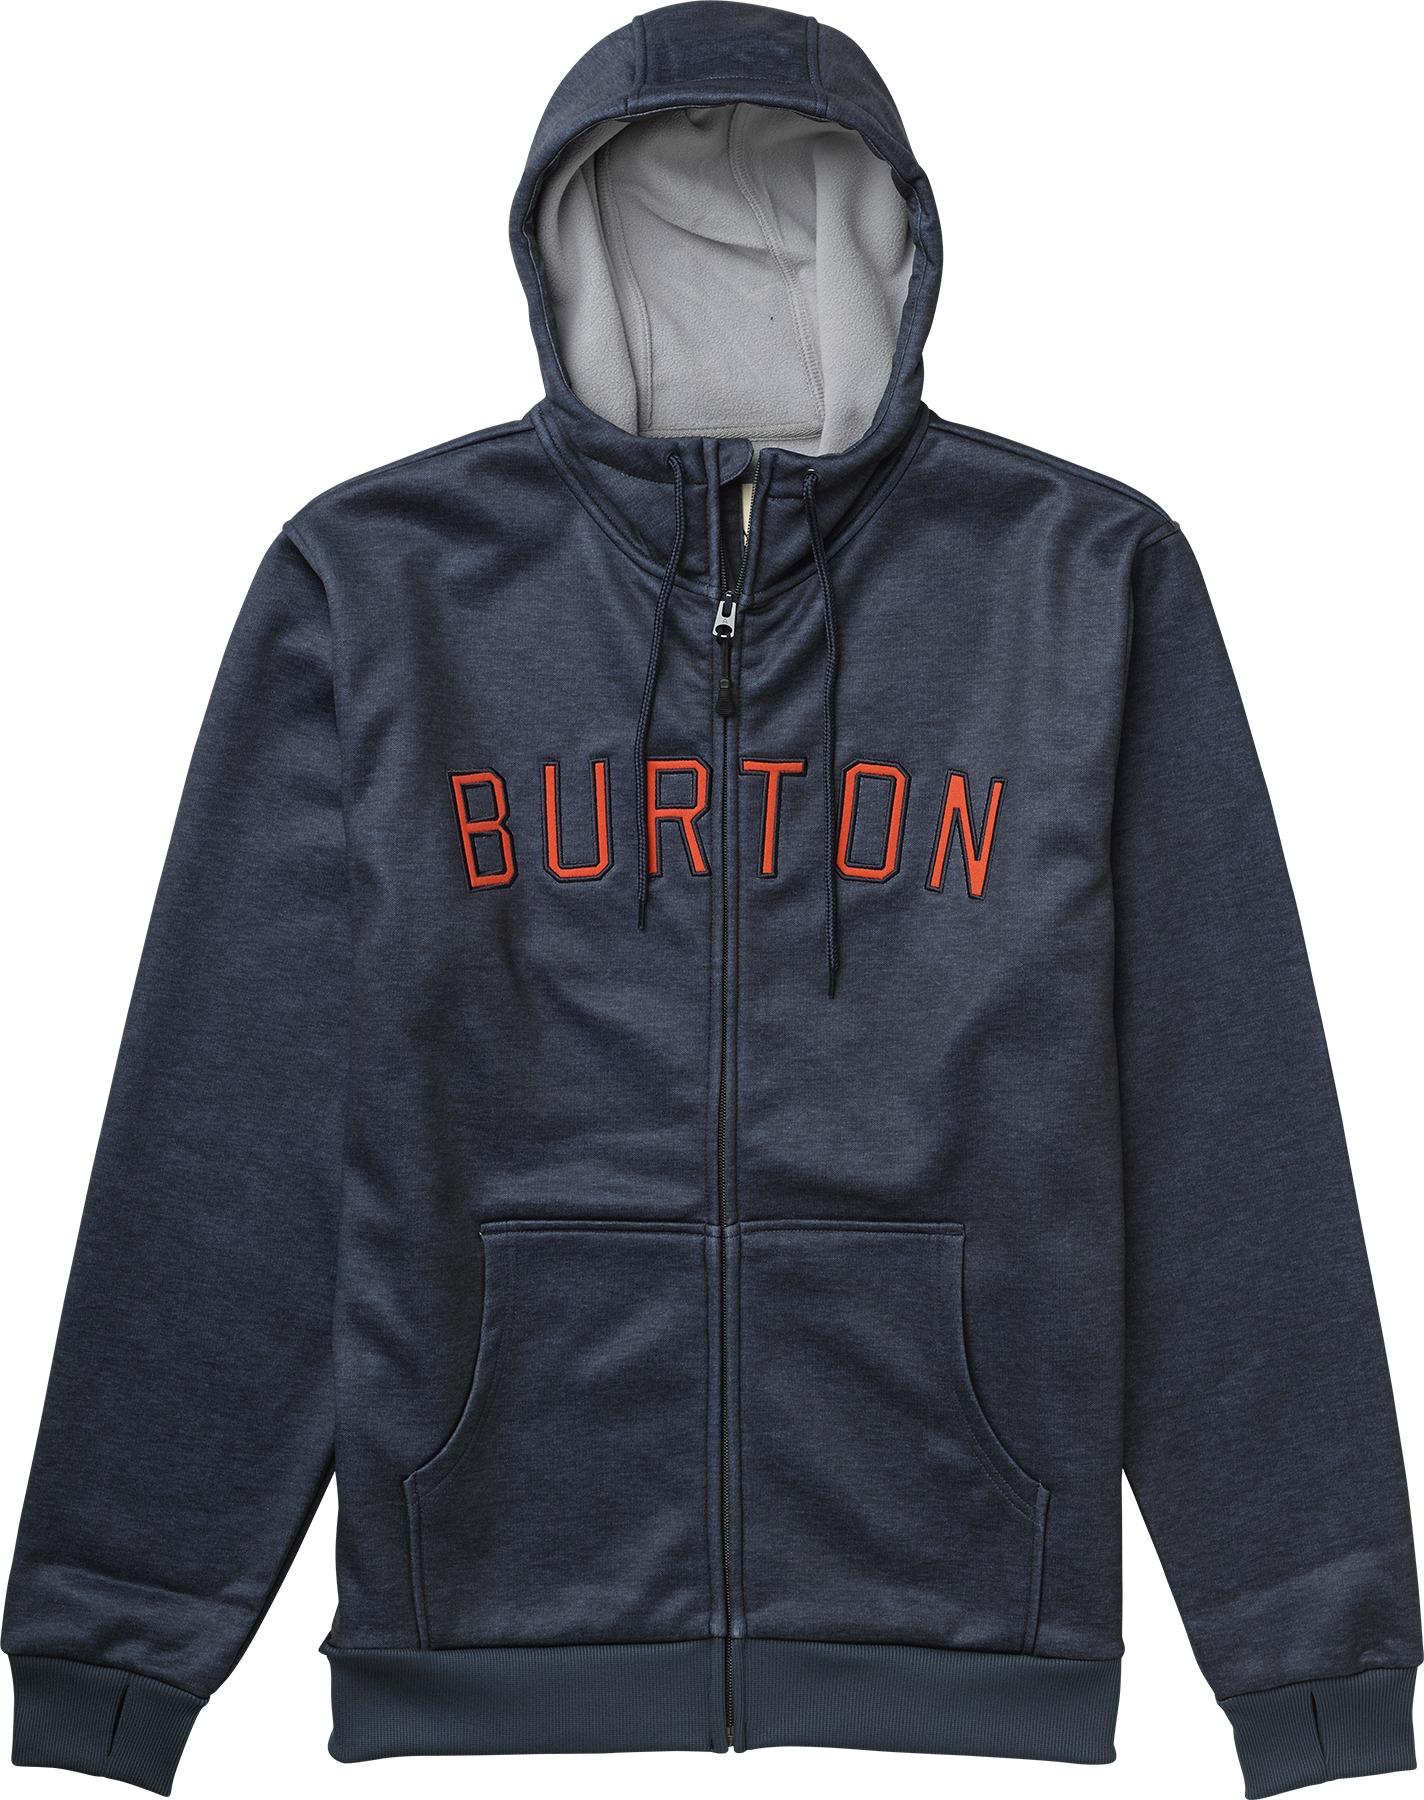 Bluza Aktywna Burton Bonded Hdd (Eclipse Heather)